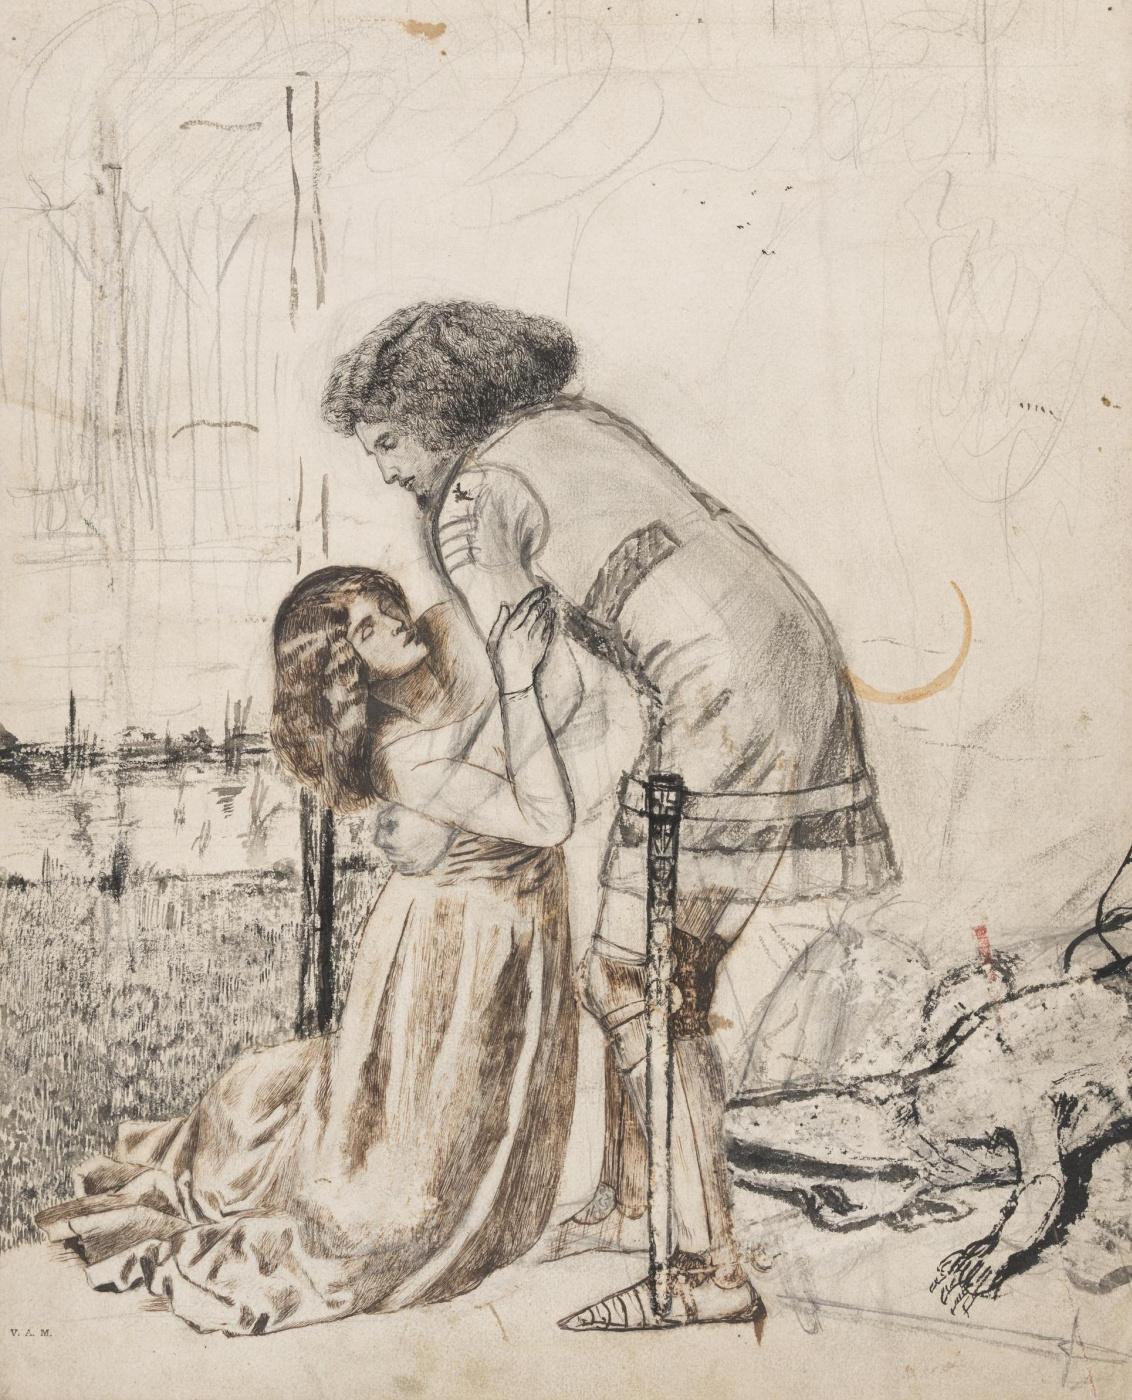 William Morris. The legend of St. George. Fragment II